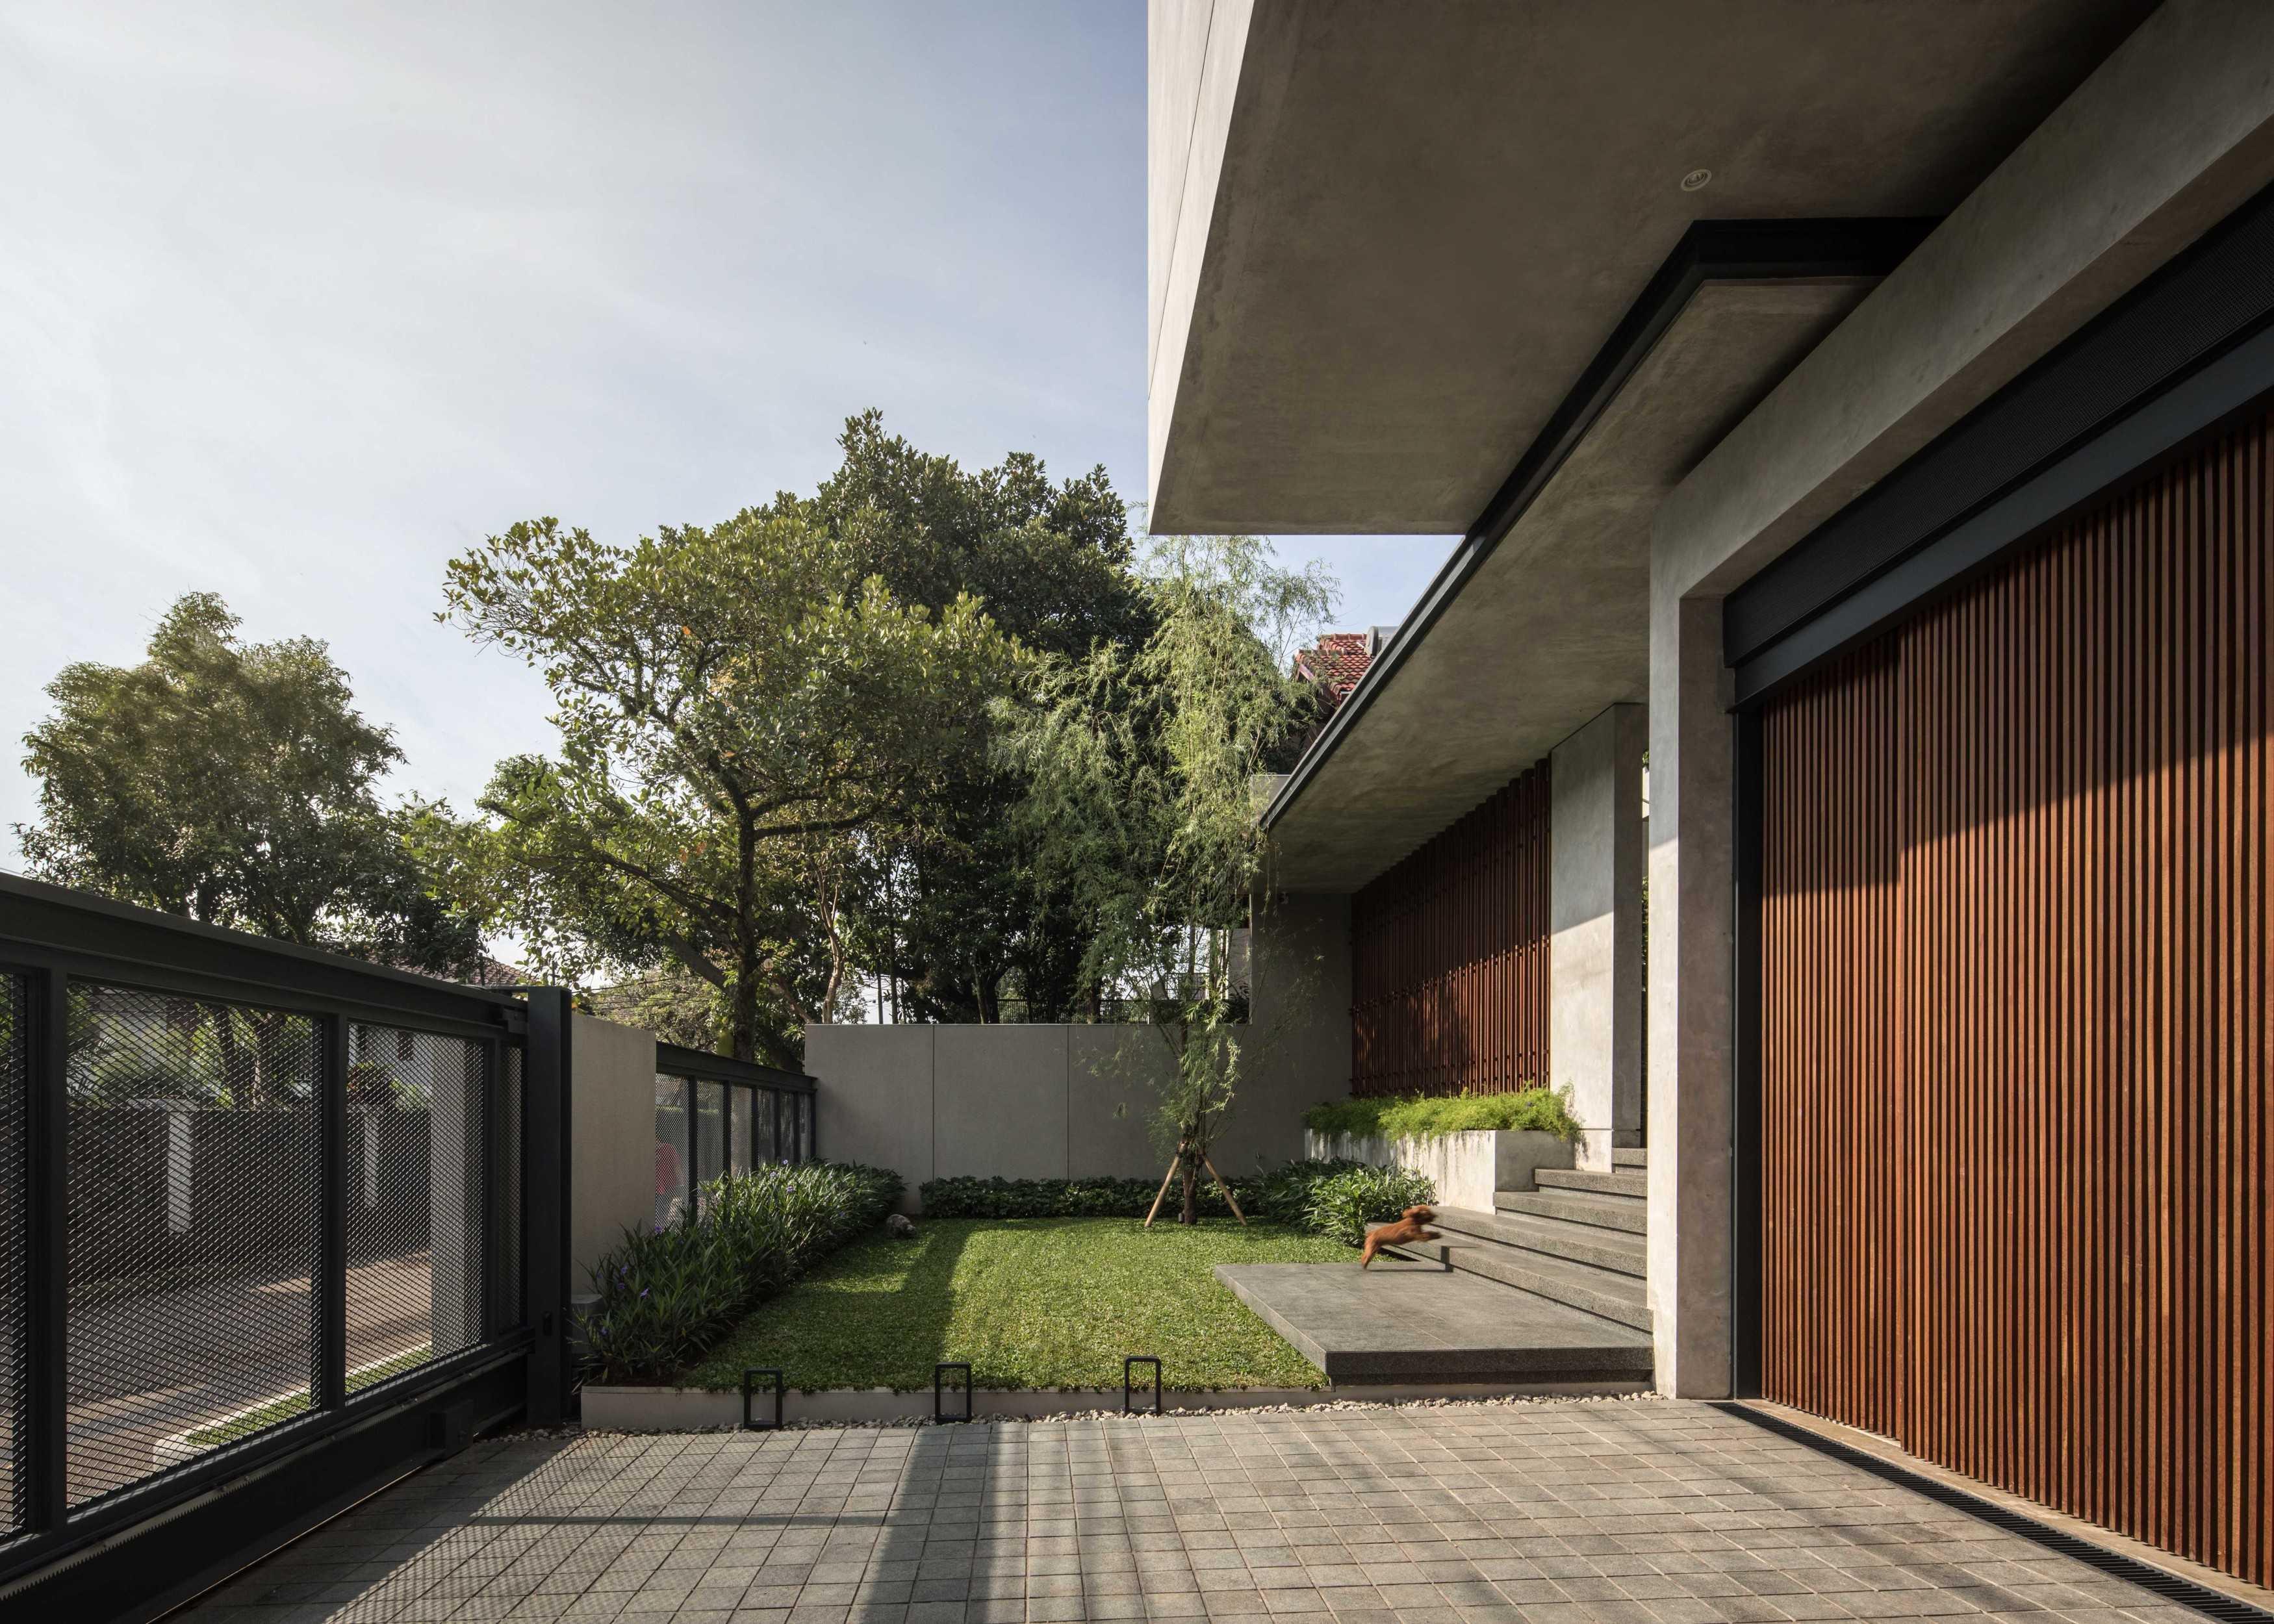 Rakta Studio Rj House Bandung, Kota Bandung, Jawa Barat, Indonesia Bandung, Kota Bandung, Jawa Barat, Indonesia Rakta-Studio-Rj-House   105914